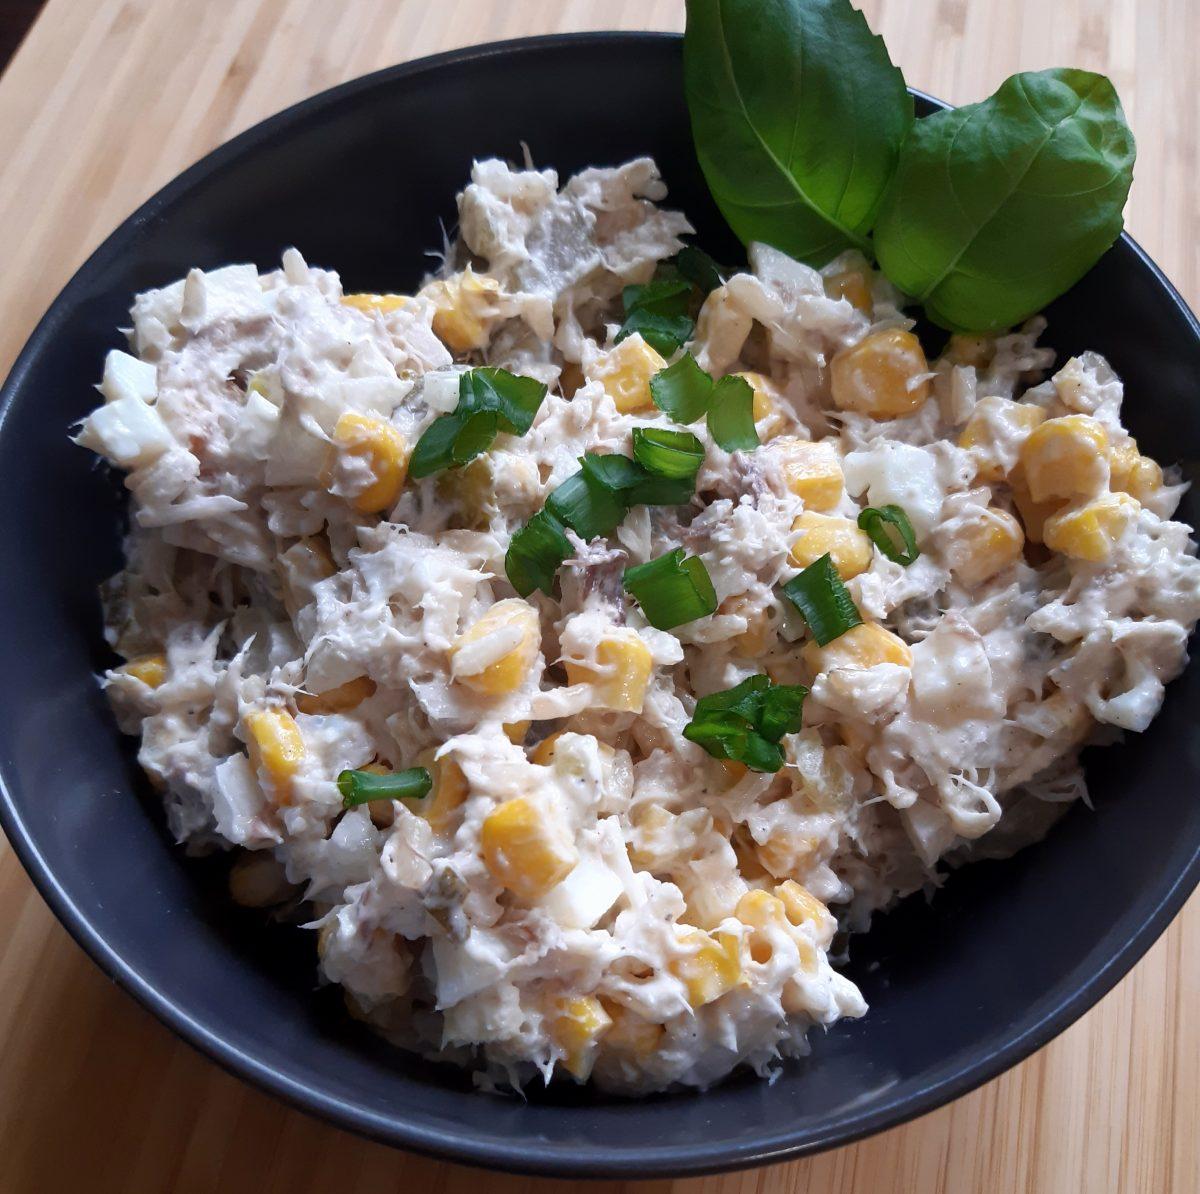 Sałatka z makrelą i ryżem